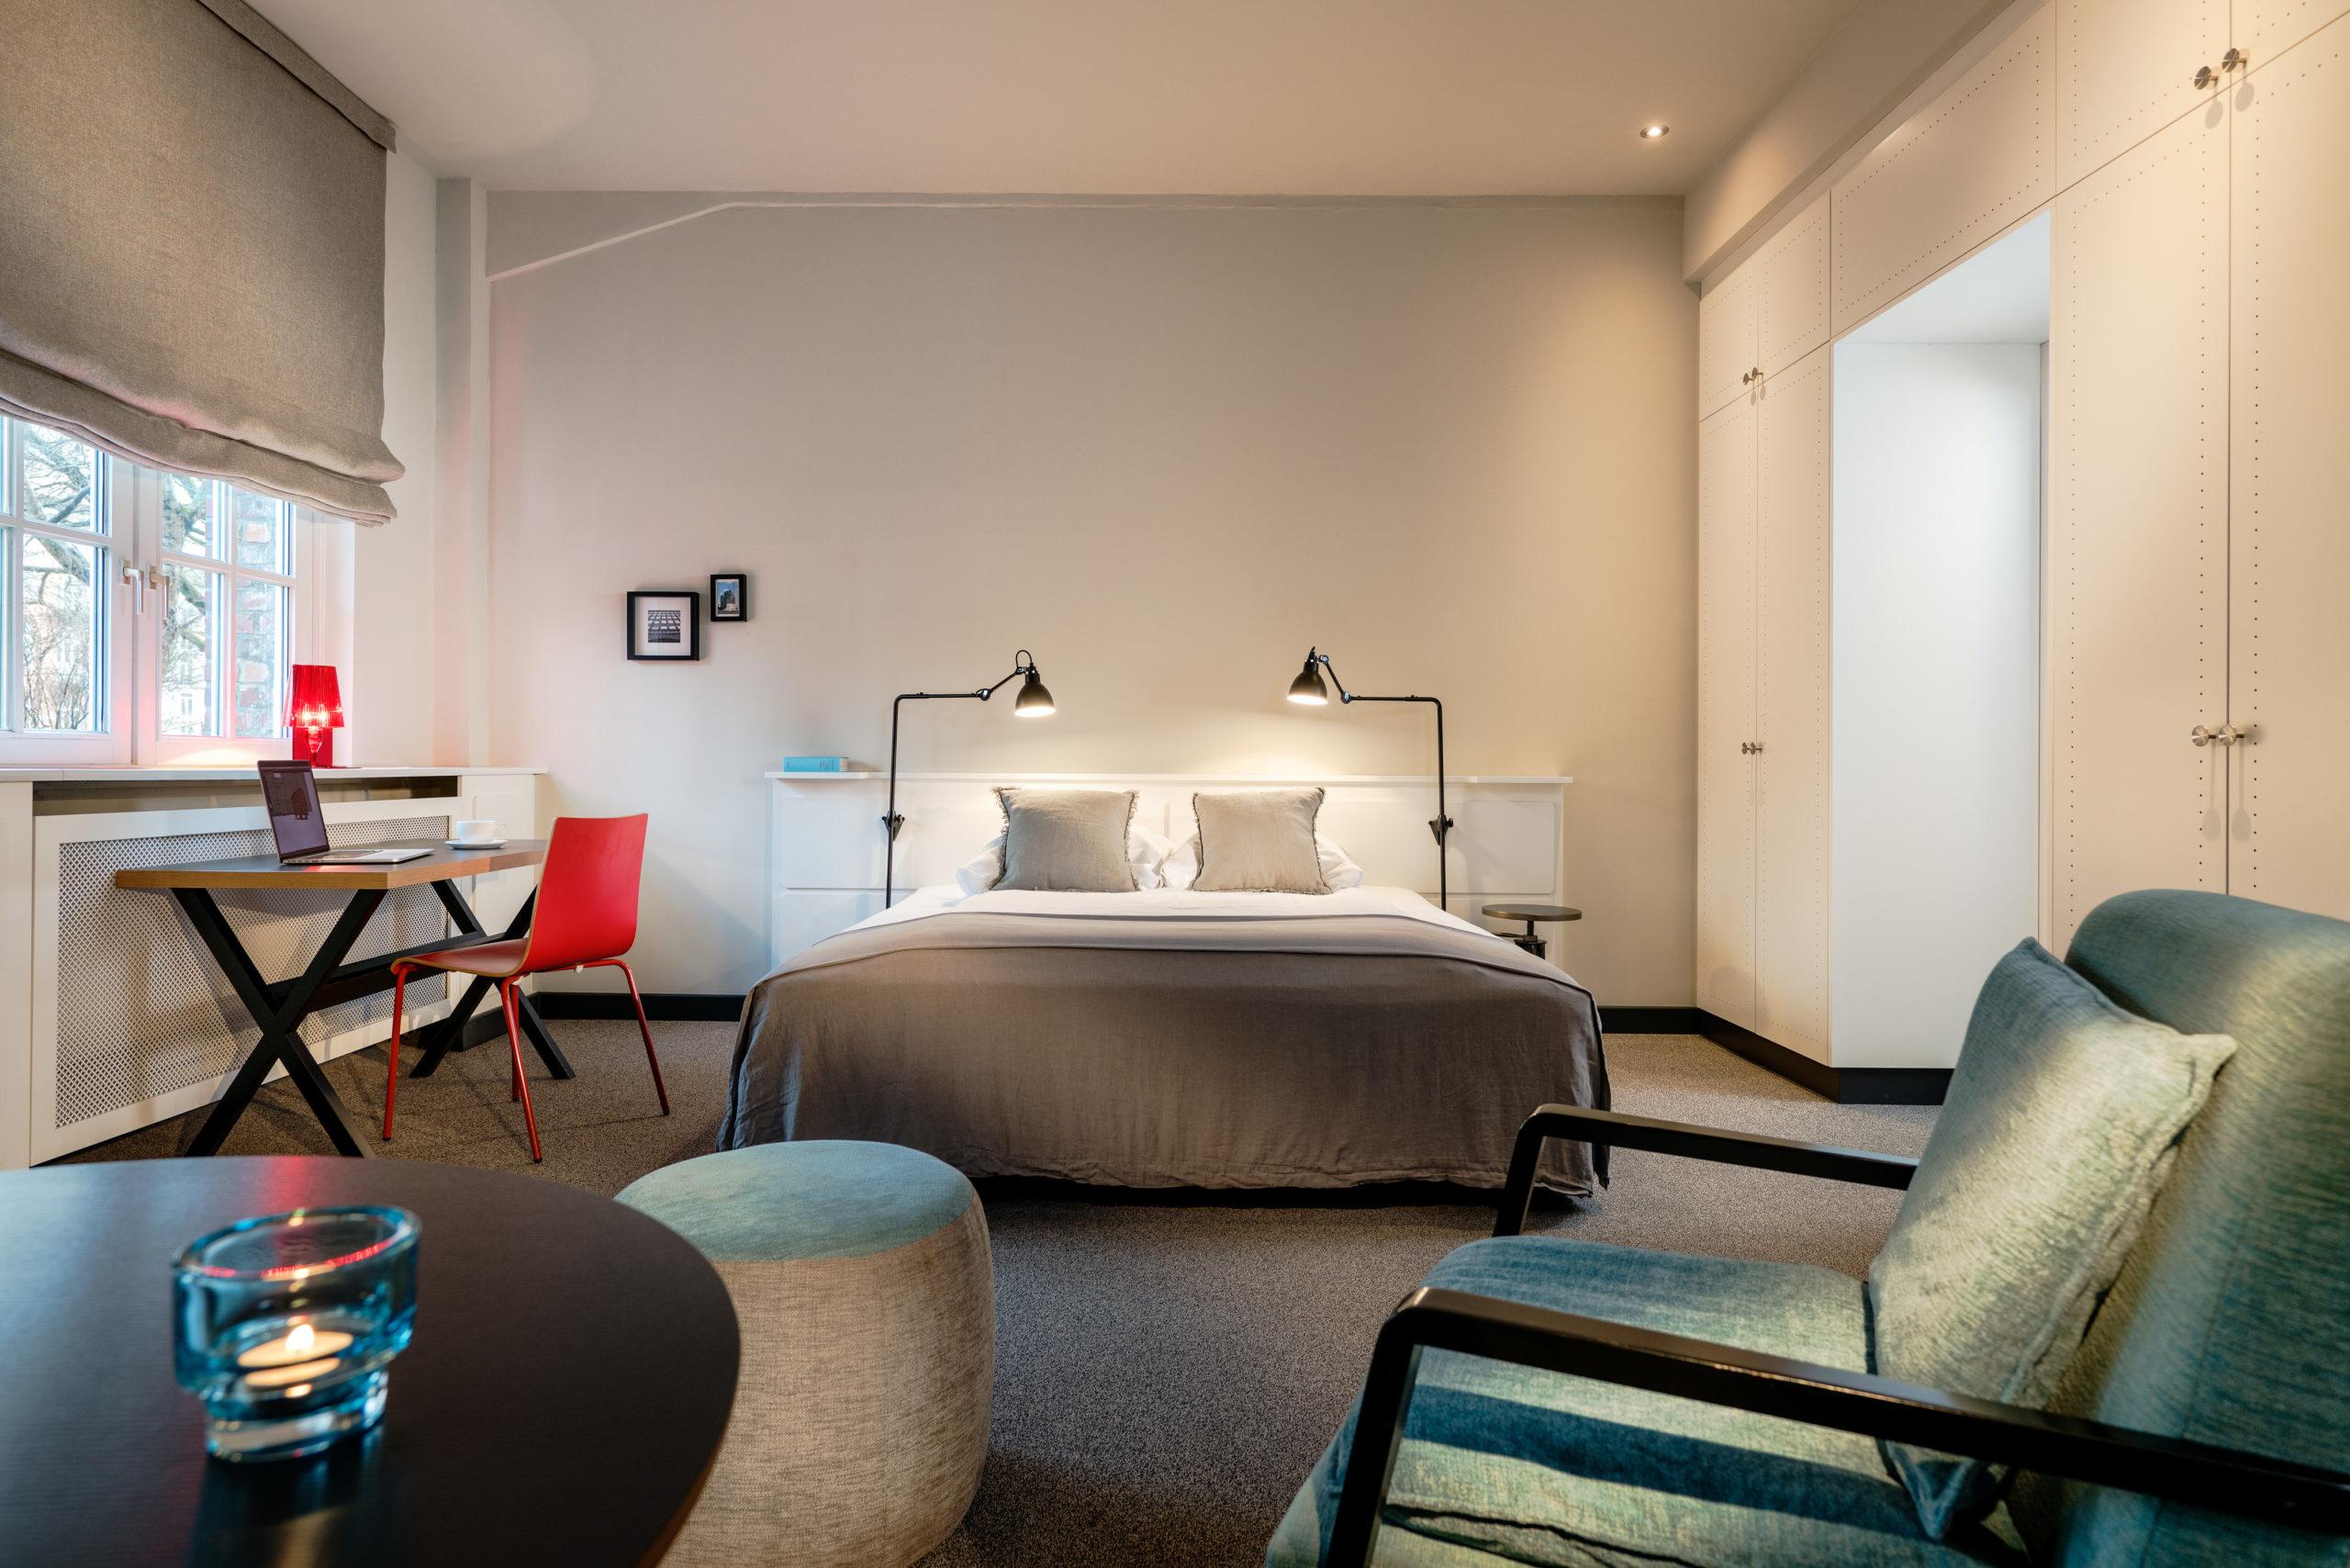 Apartmenthaus Hamburg: Apartment040 Boradinghouse & Serviced Apartments in Hamburg